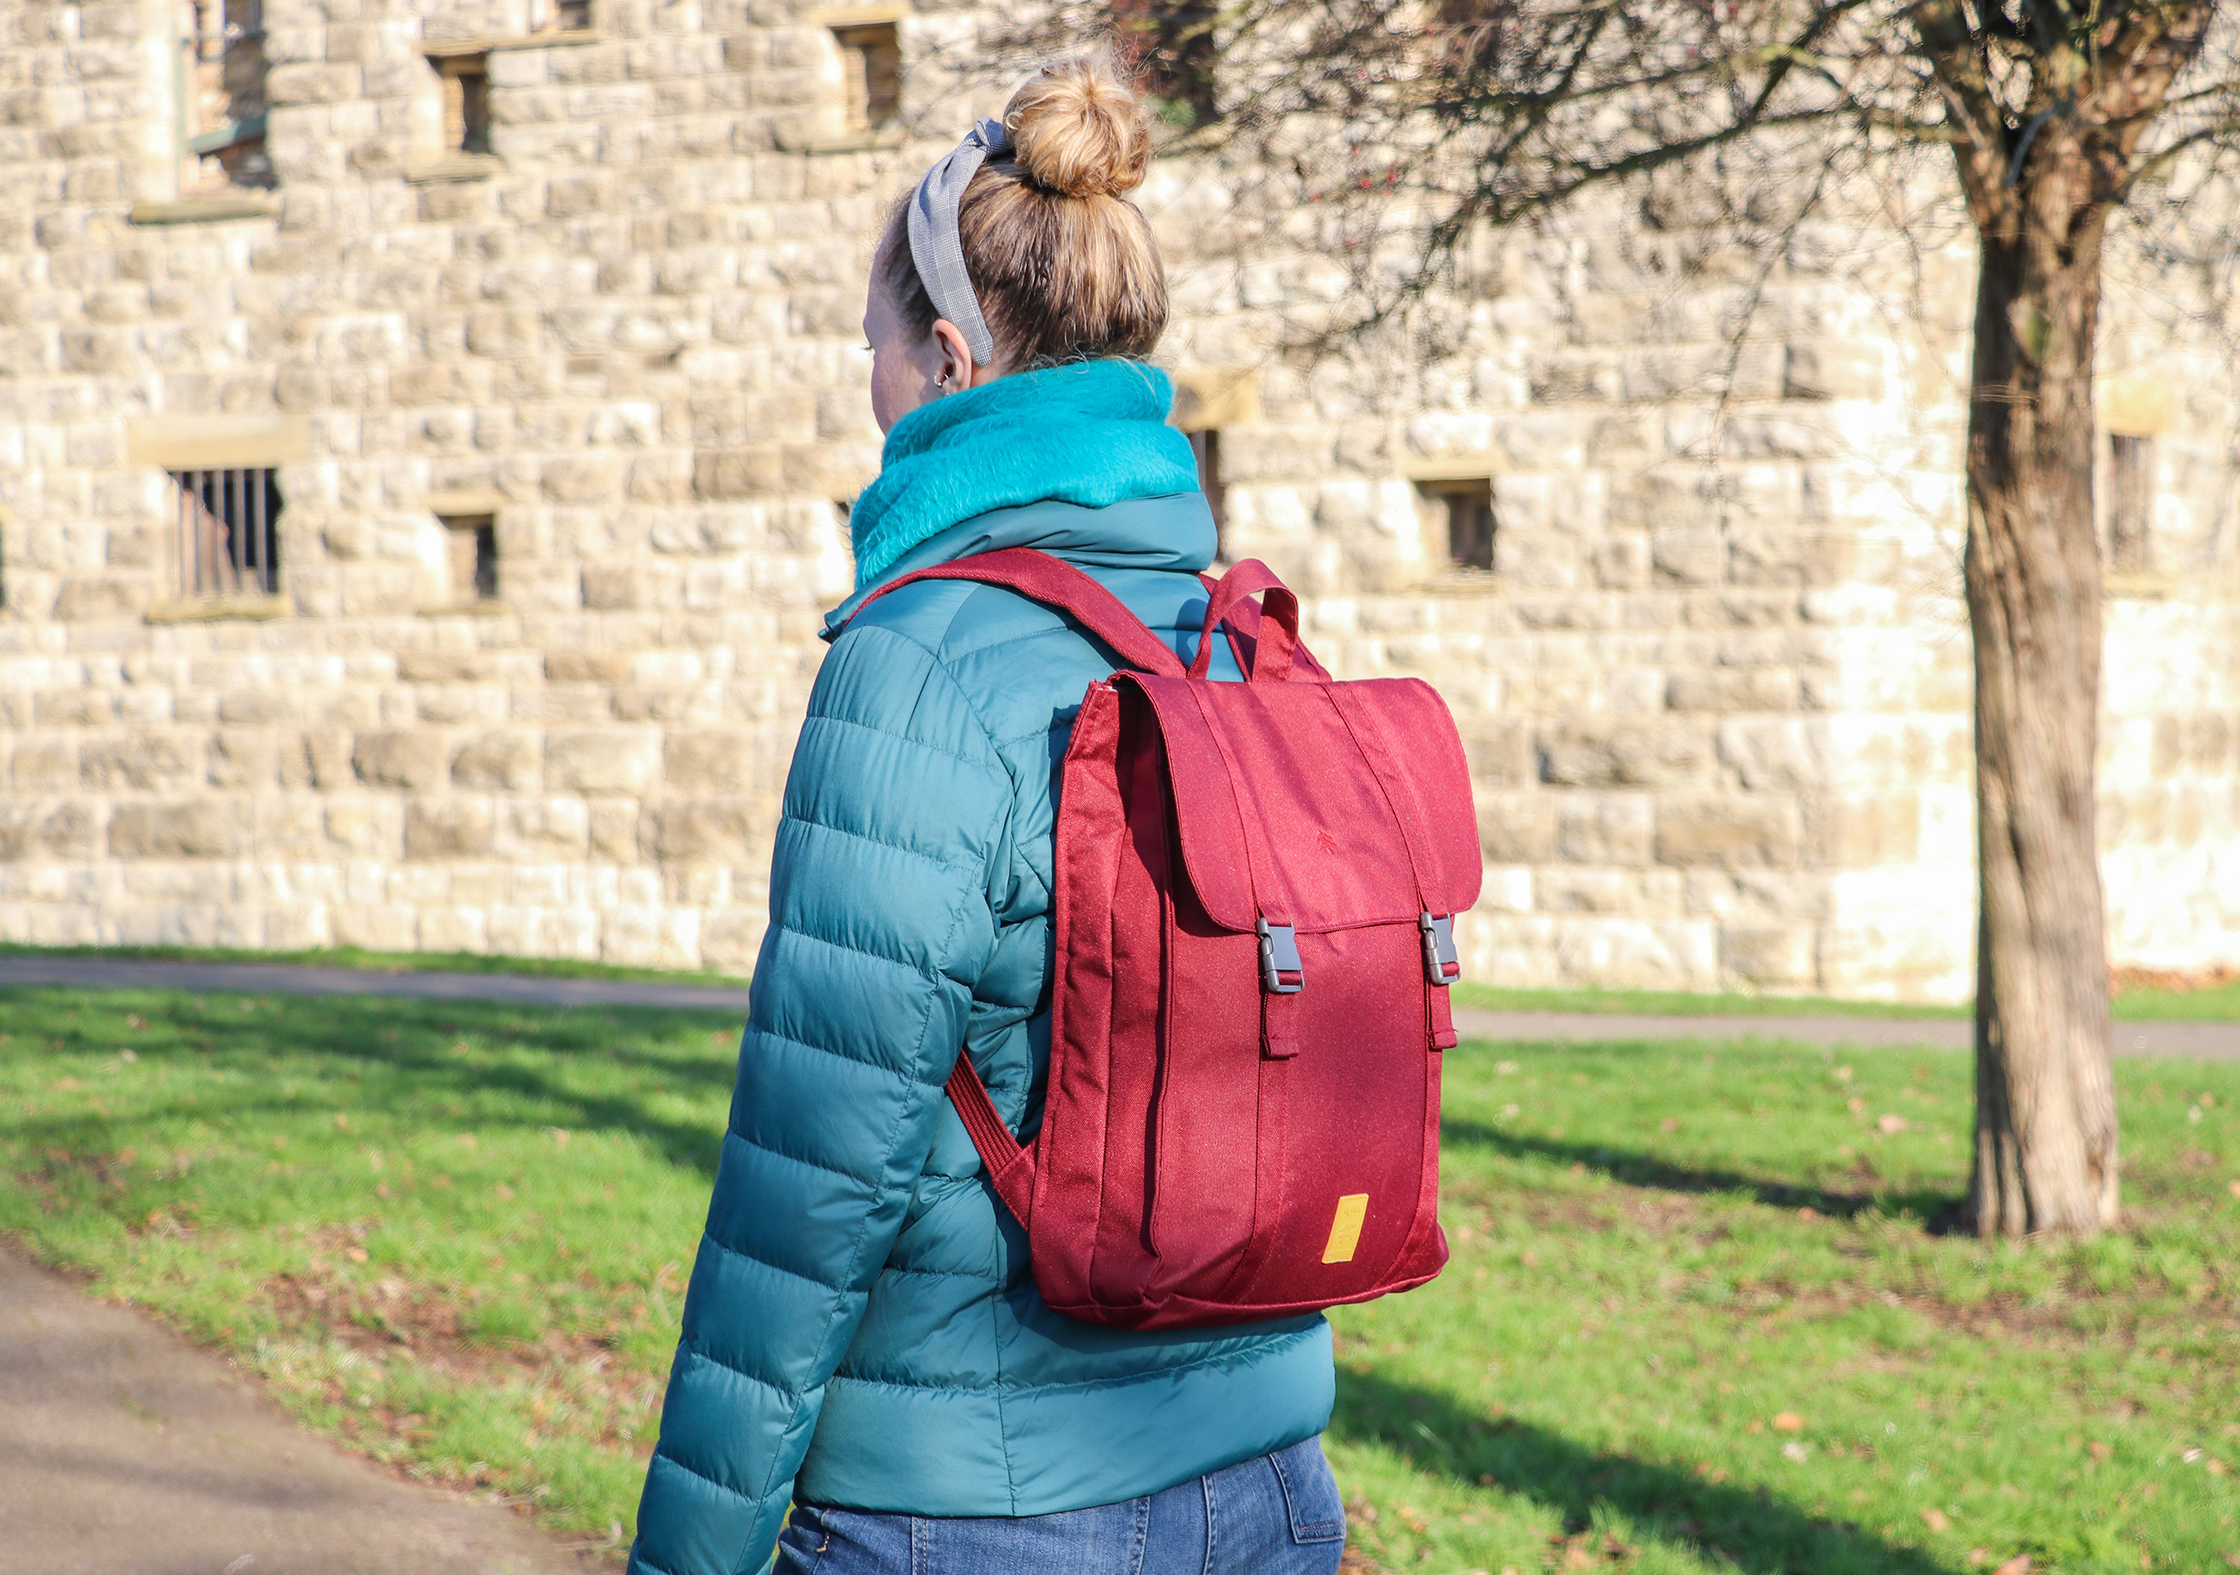 Lefrik Handy Backpack In Essex, England